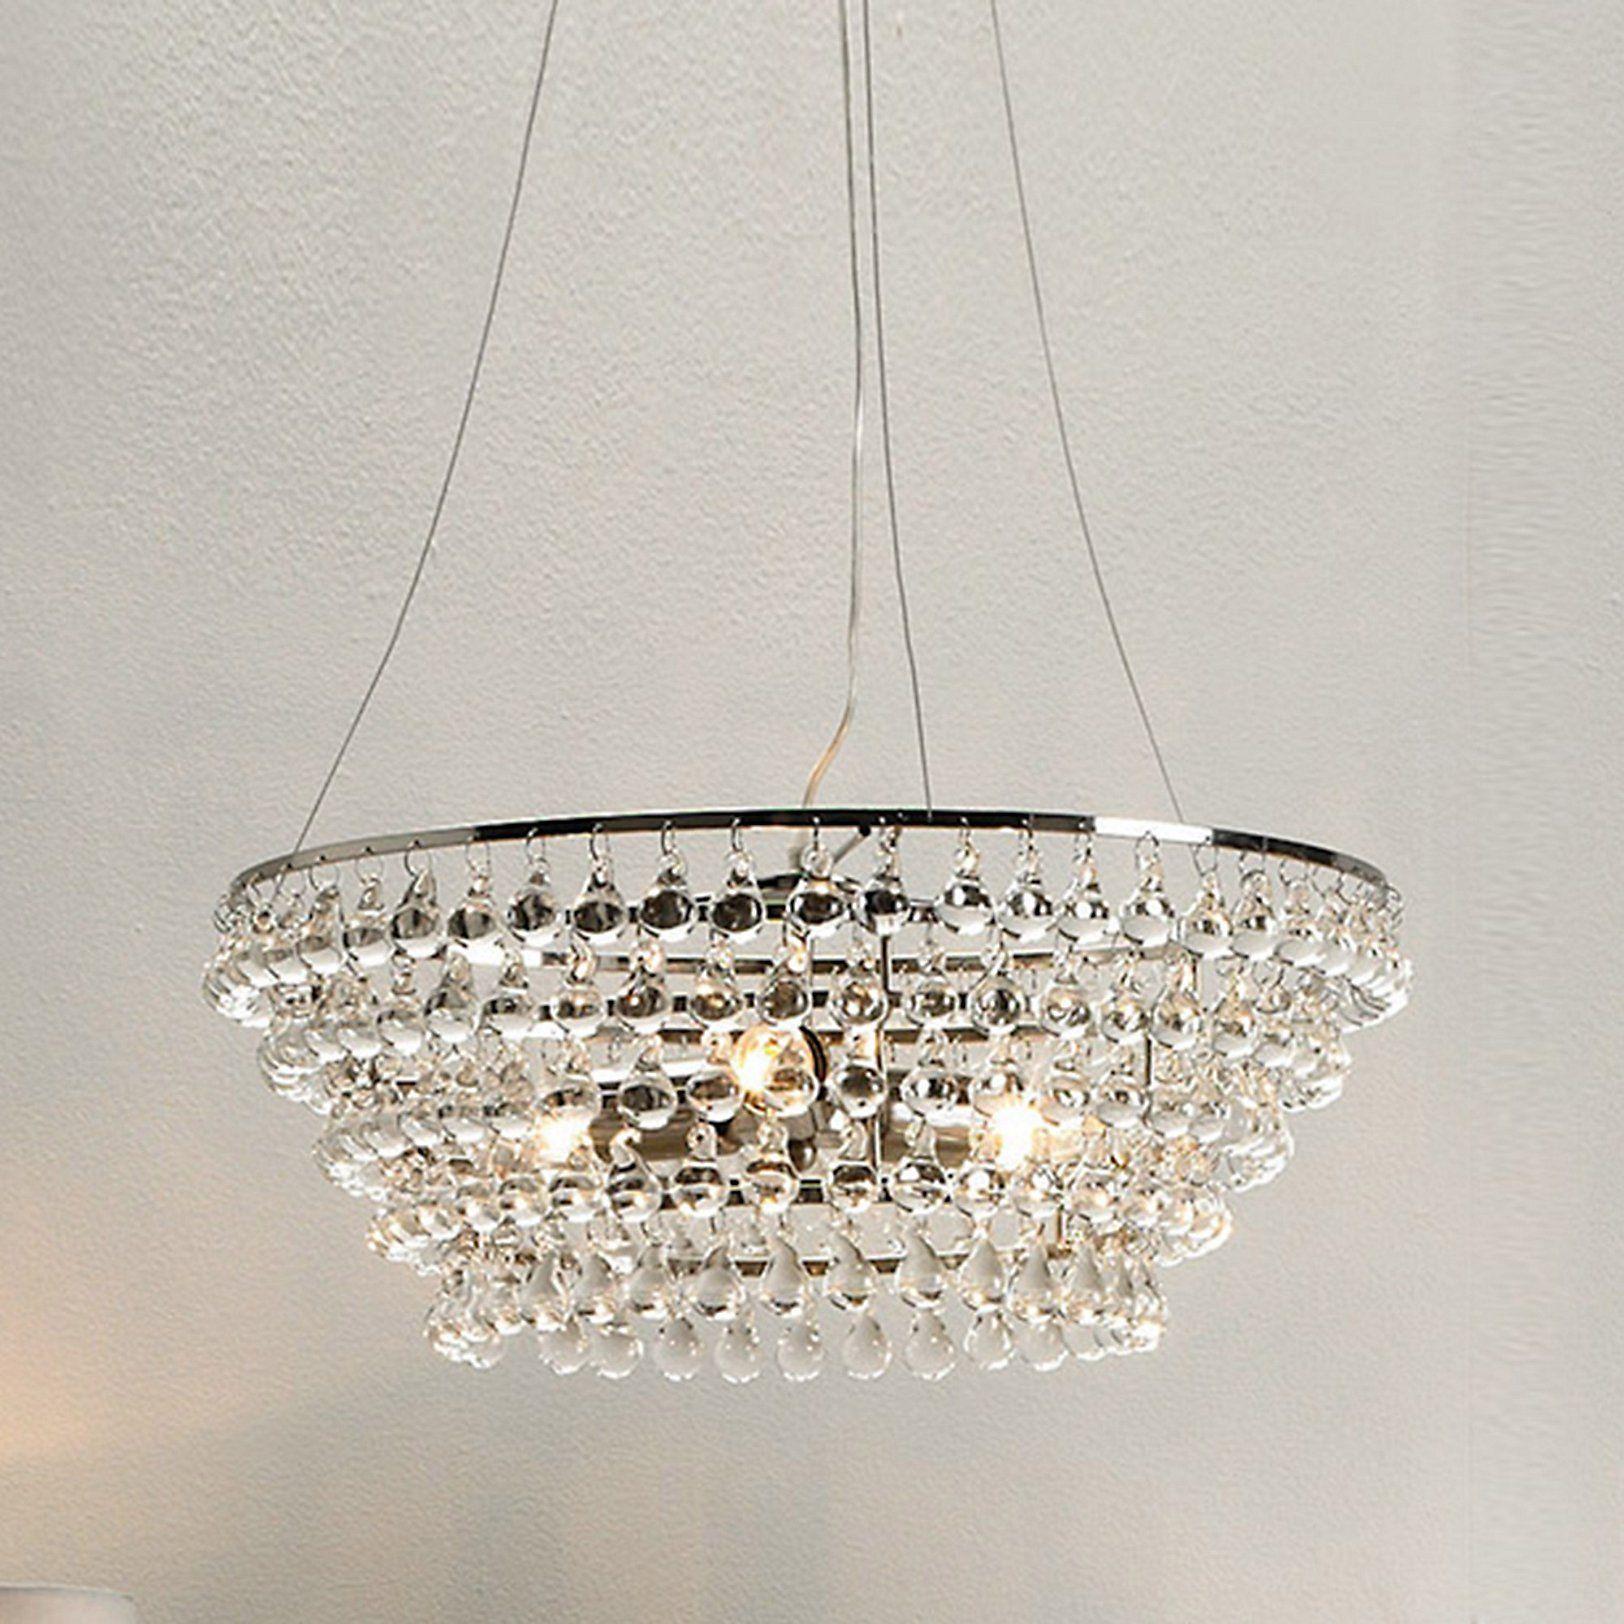 Solid Glass Orb Chandelier Large Ceiling Lights Home